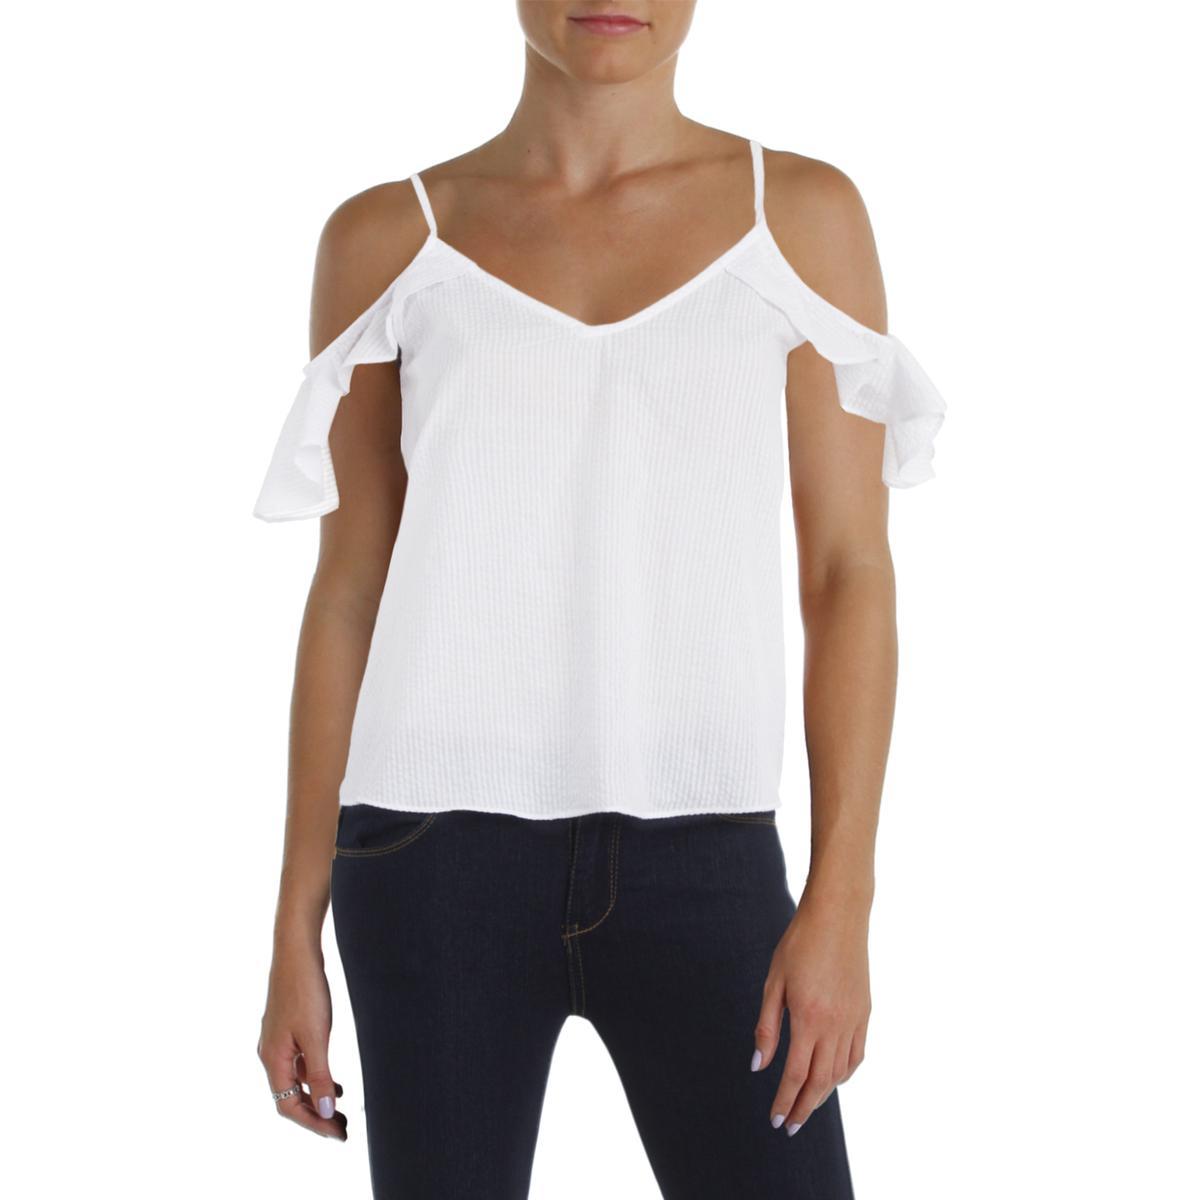 e335b41245347 Details about Aqua Womens White Textured Sheer Cold Shoulder Crop Top Shirt  M BHFO 2678